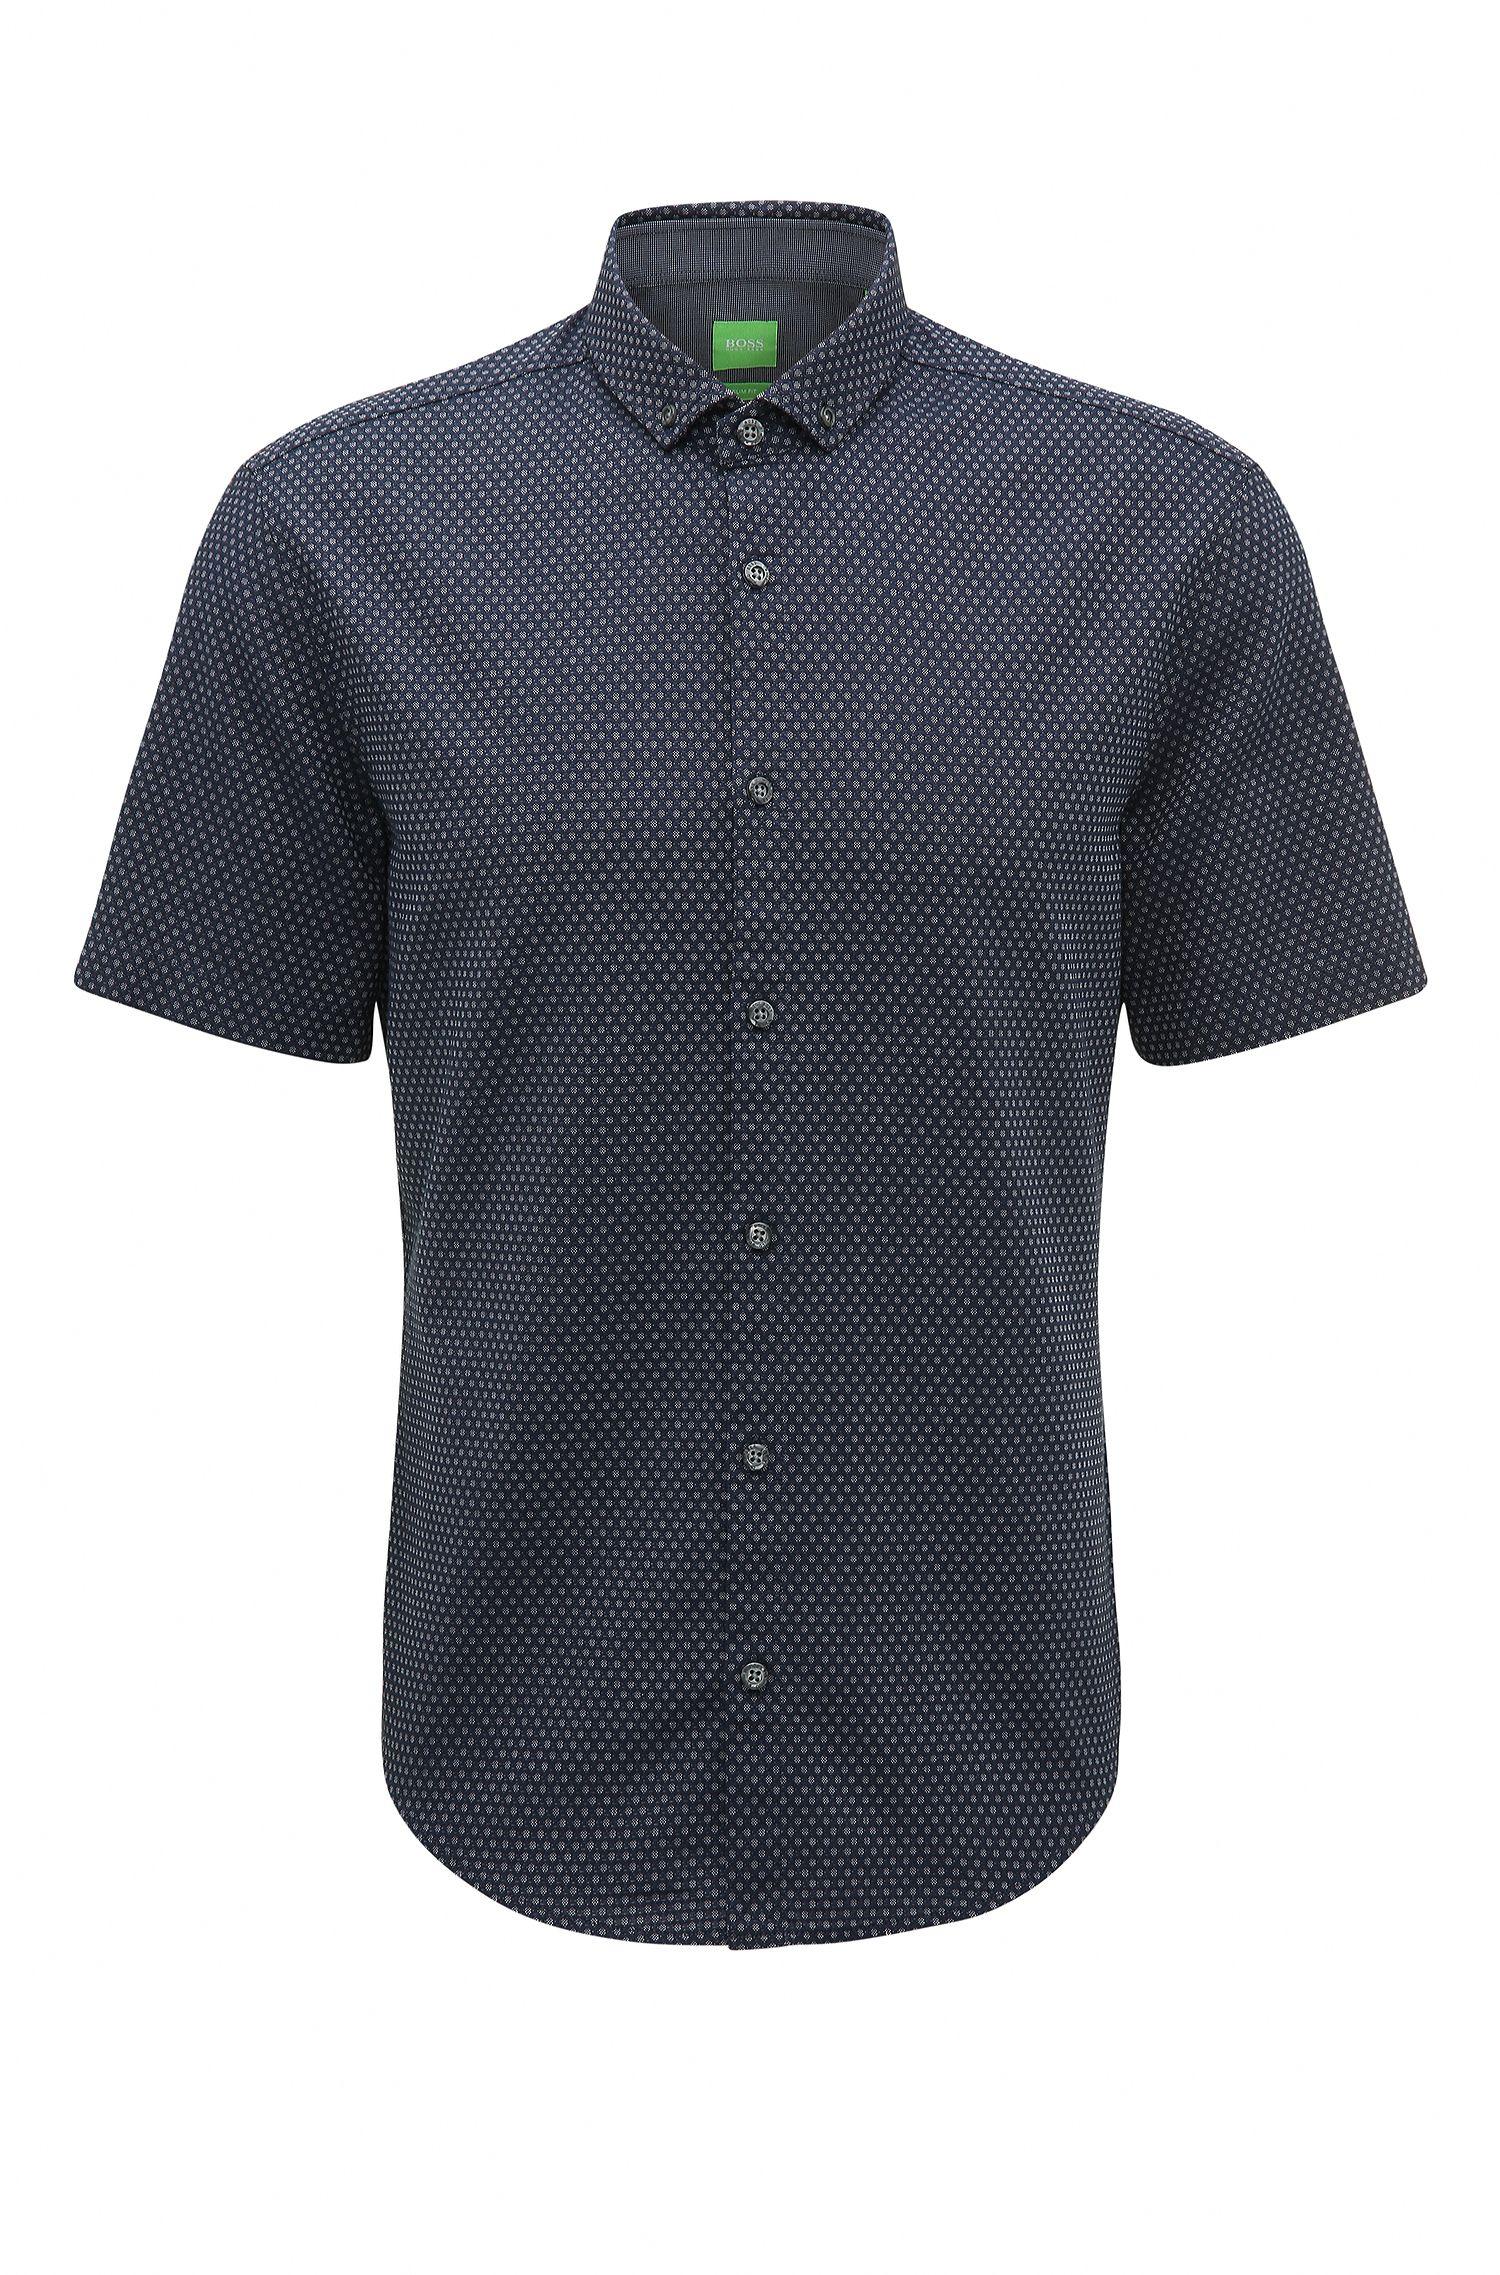 'C-Bonettino' | Slim Fit, Birdseye Cotton Button-Down Shirt